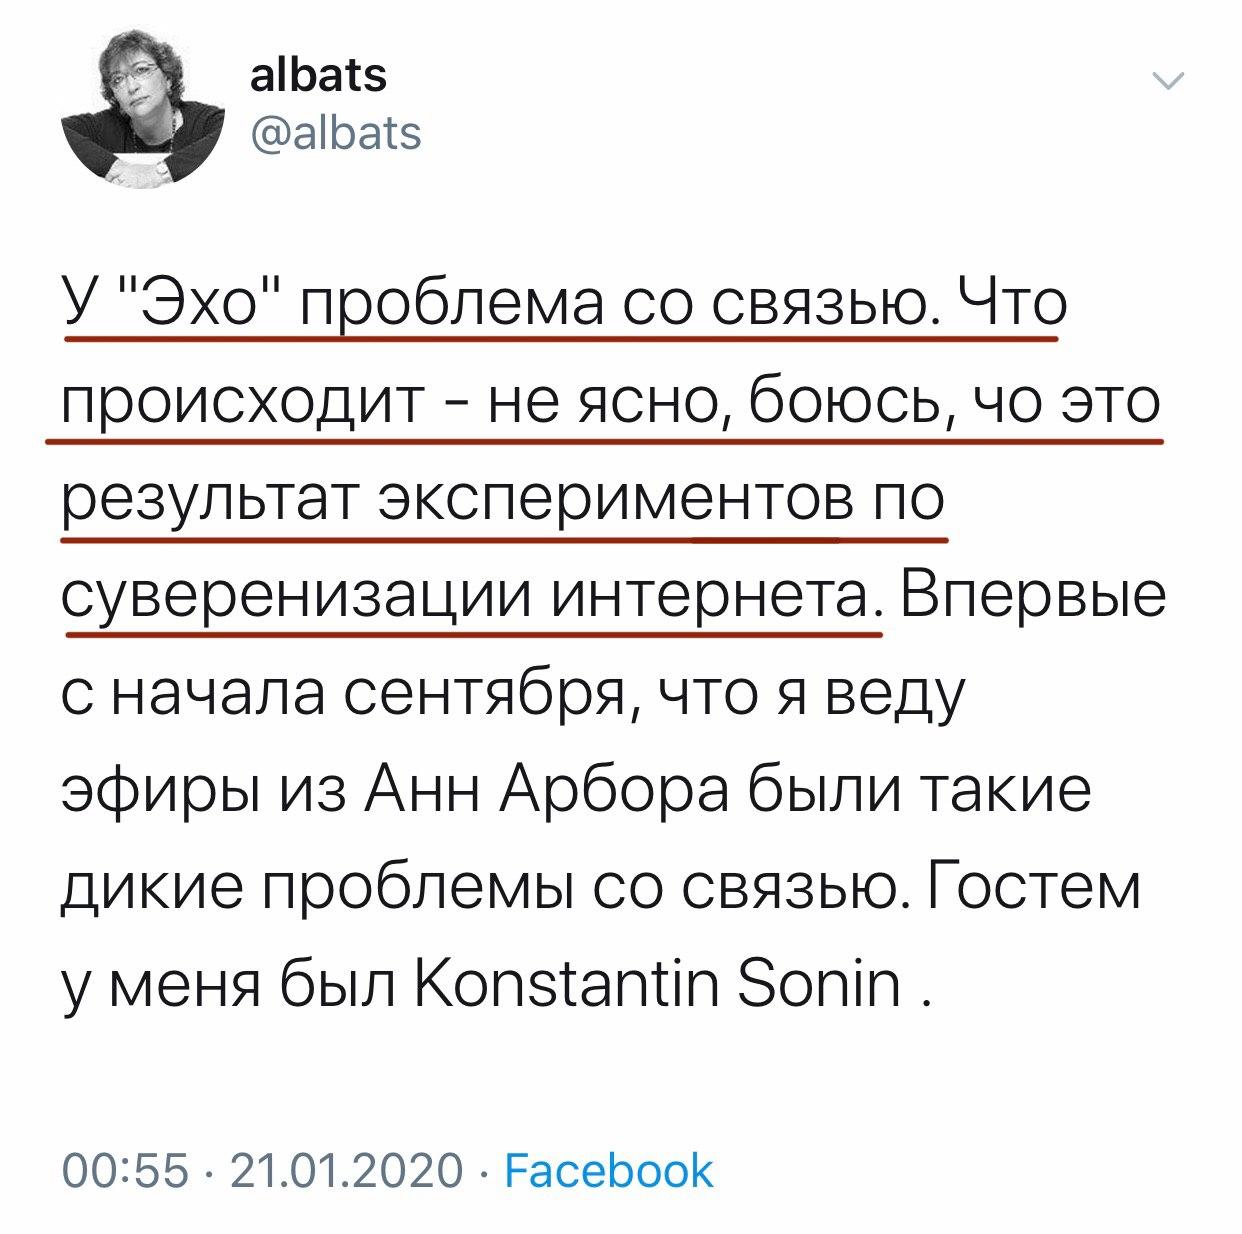 https://i1.imageban.ru/out/2020/01/21/c1193fe933abf14550a244d6a0bb4590.jpg